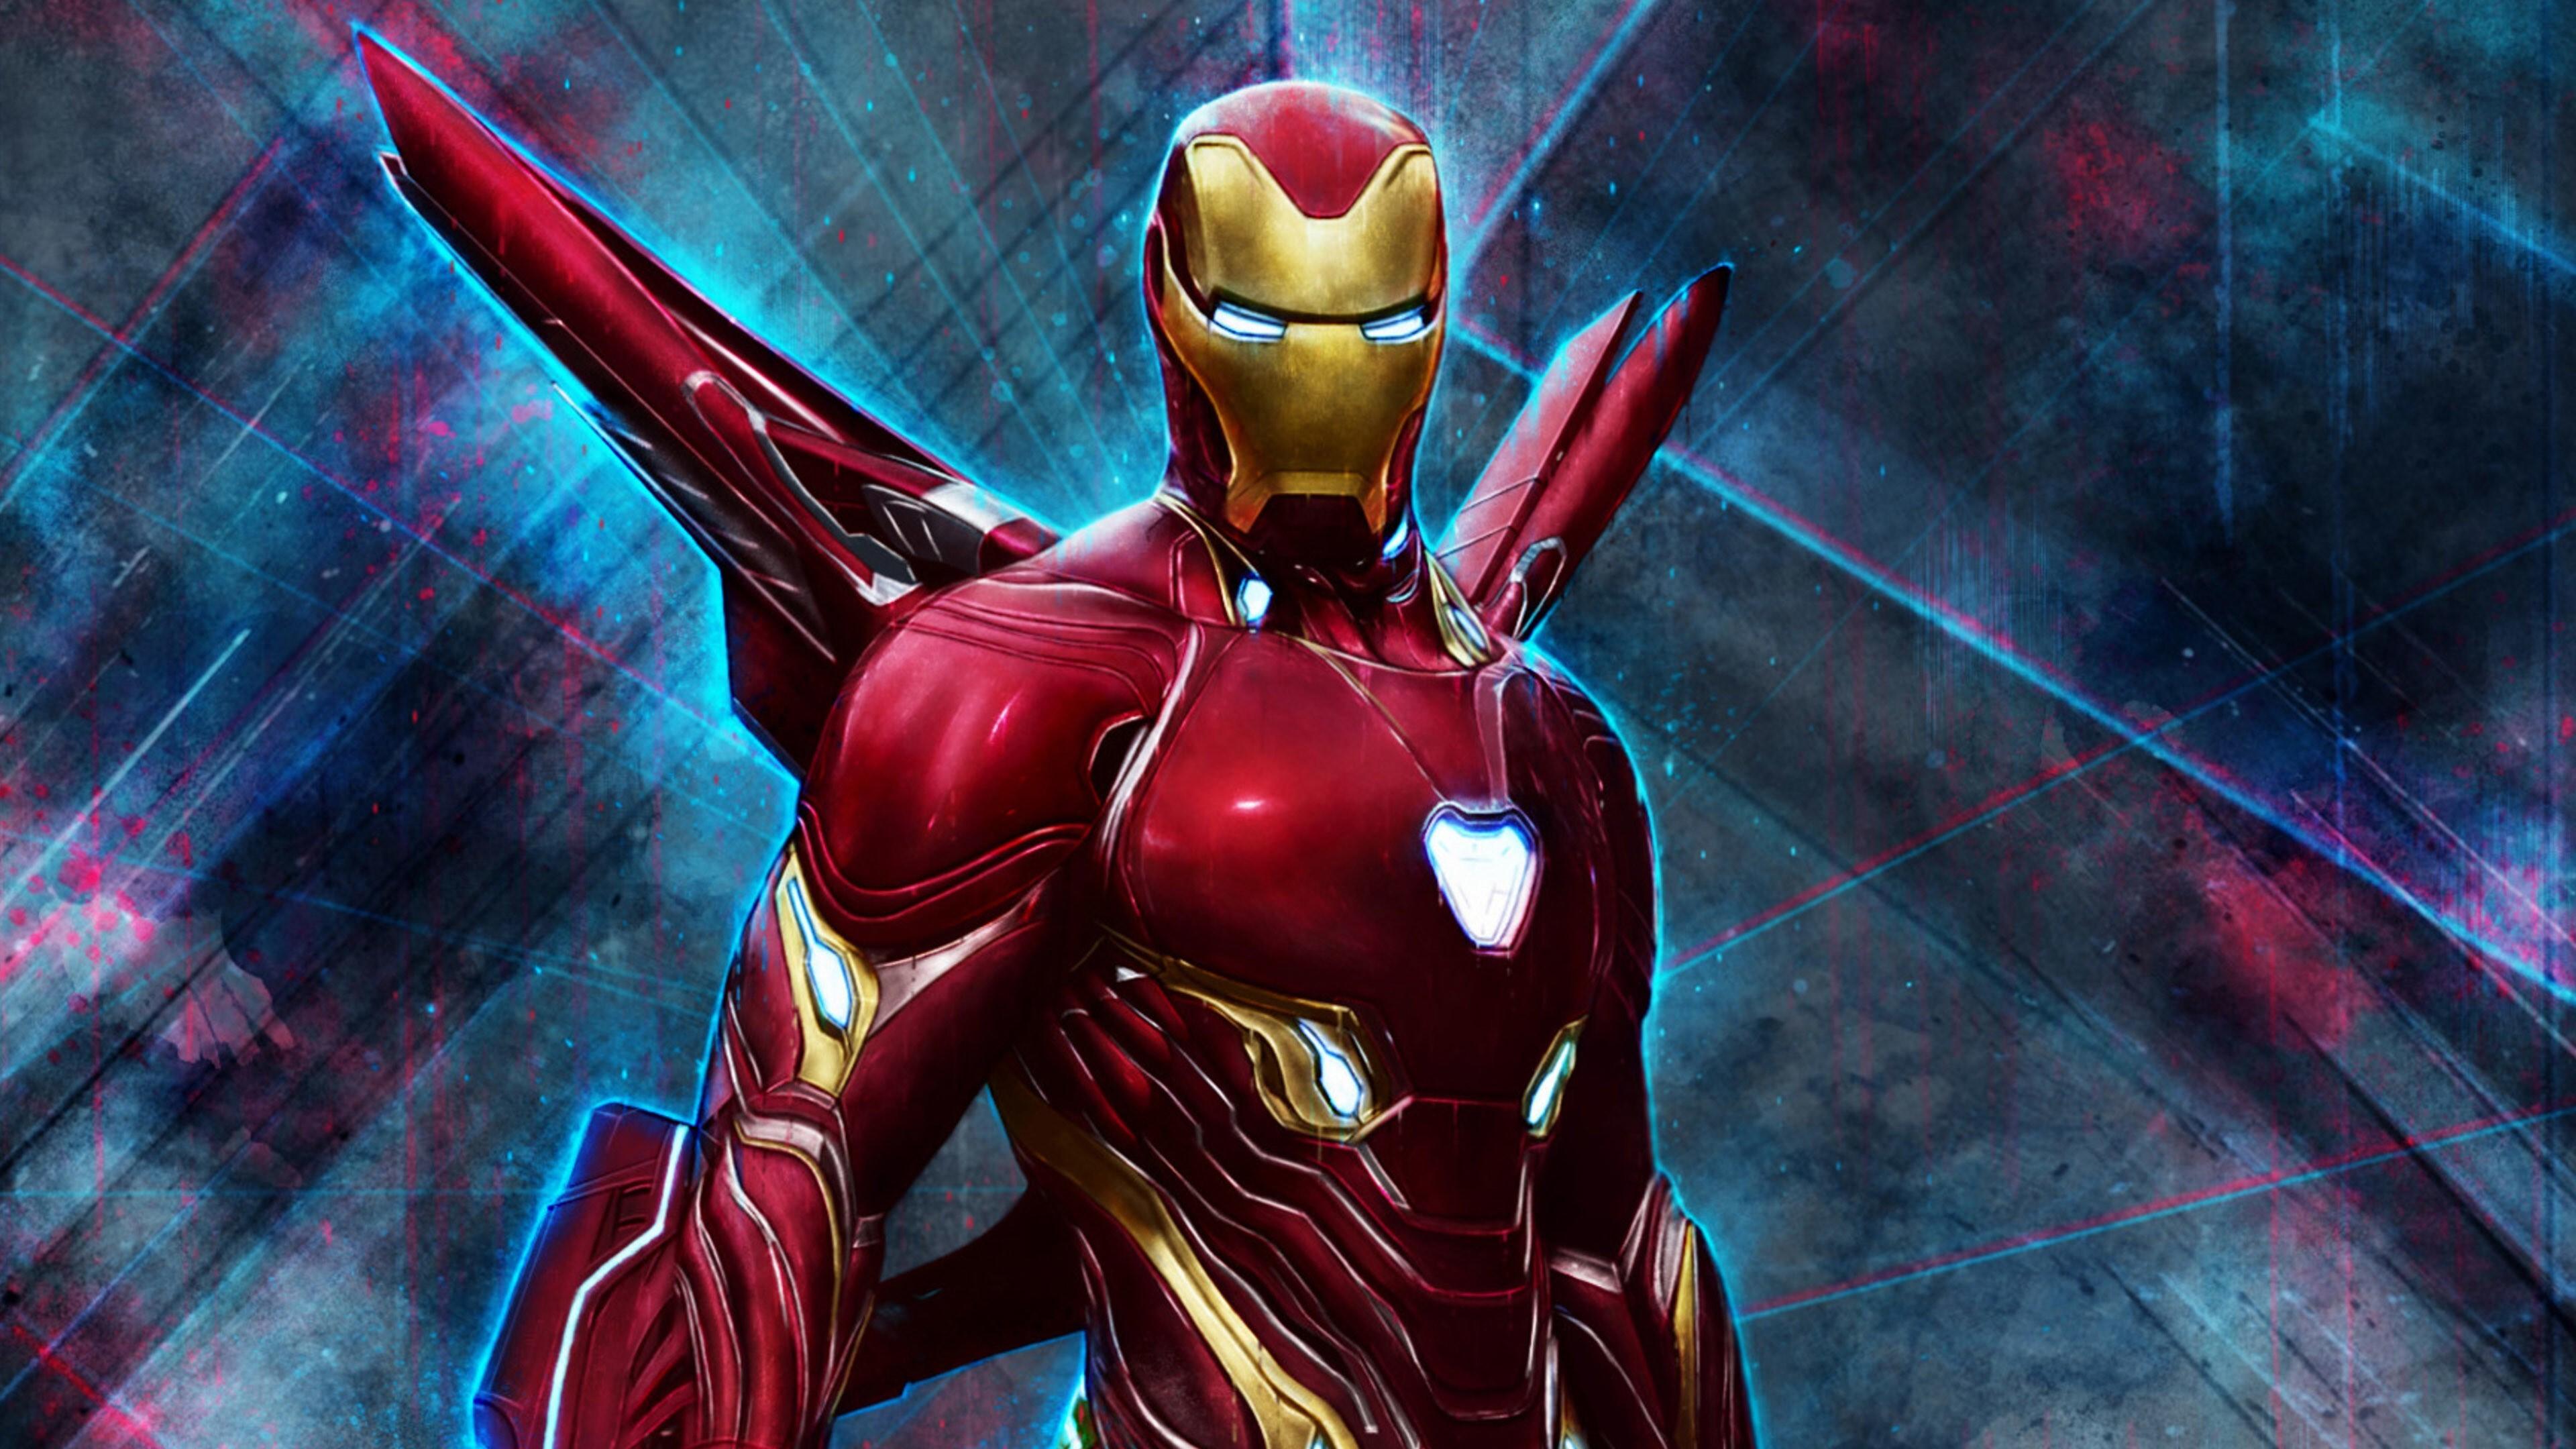 4K Pic of Superhero Iron Man | HD Wallpapers